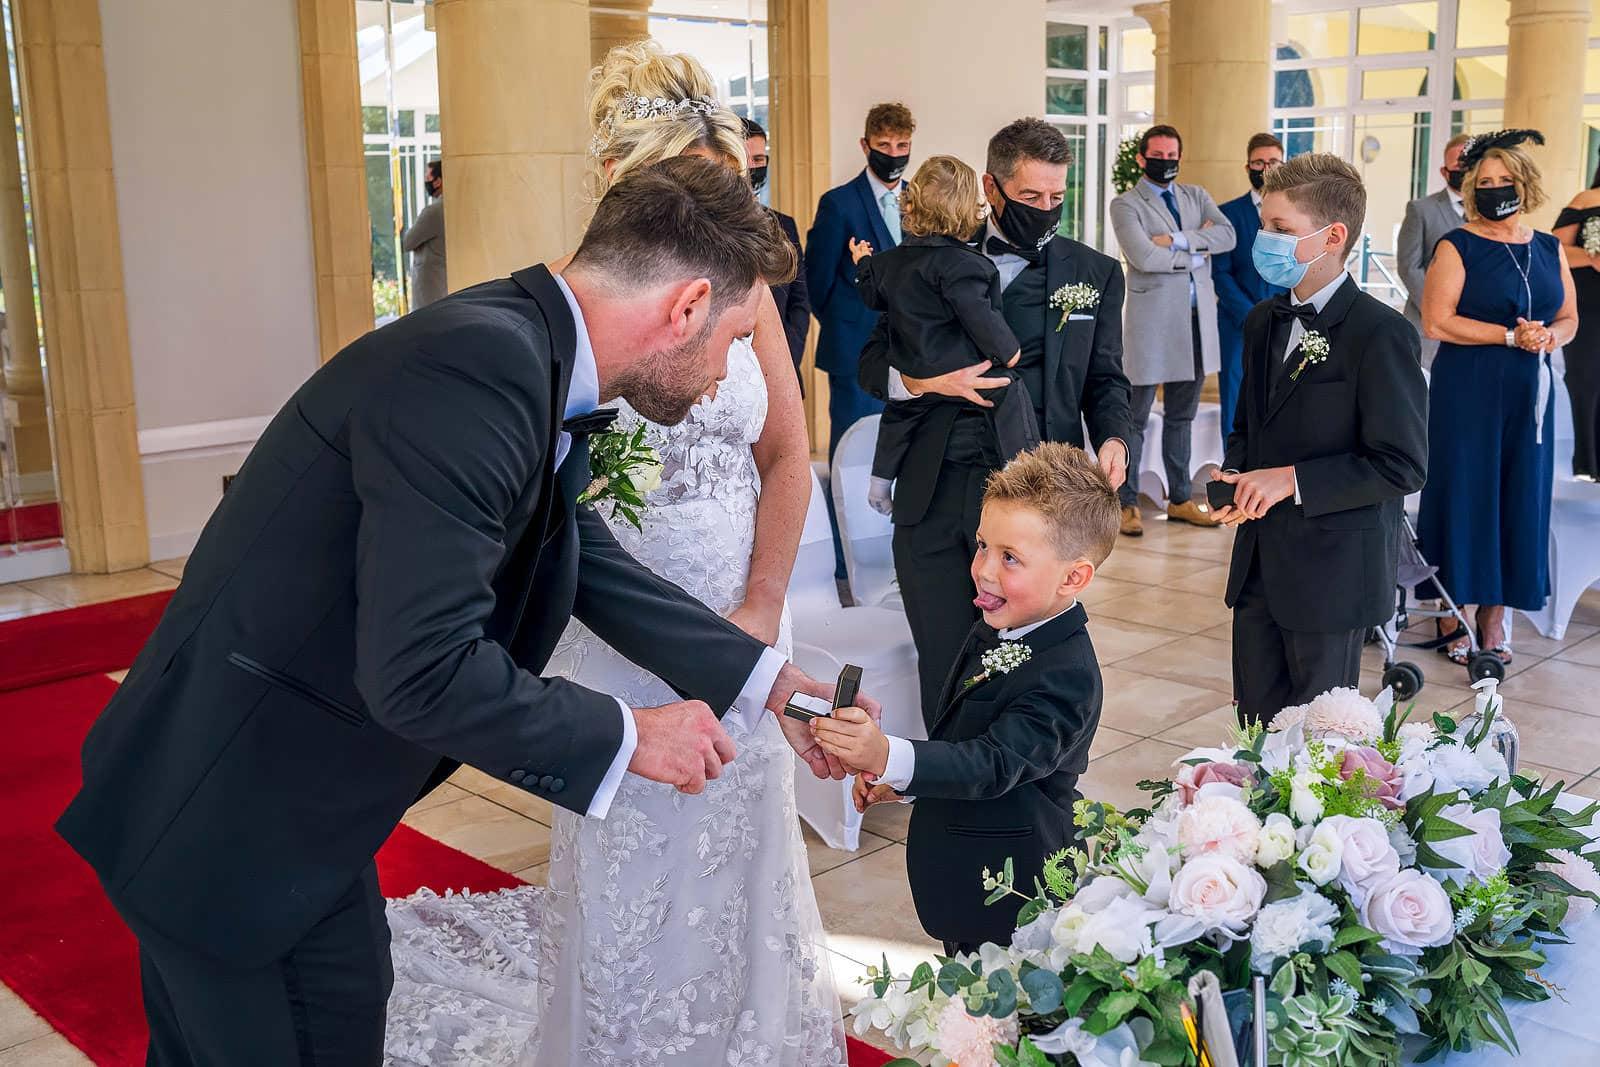 One of Wales best wedding venues